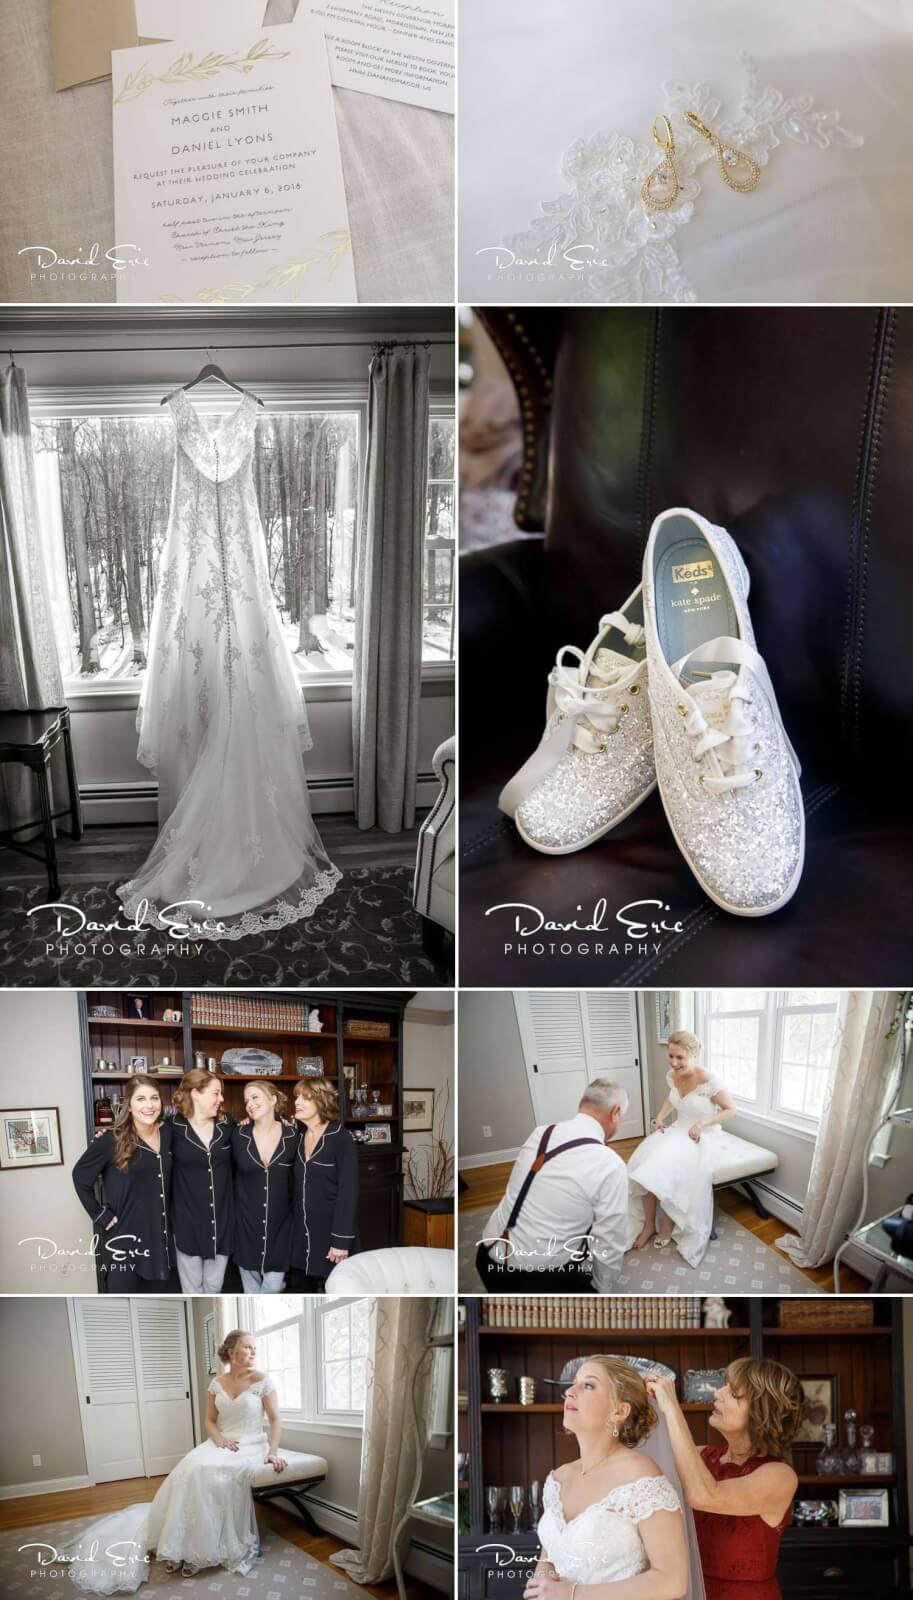 wedding photo at the westin govornor morris in Brides Prep photos